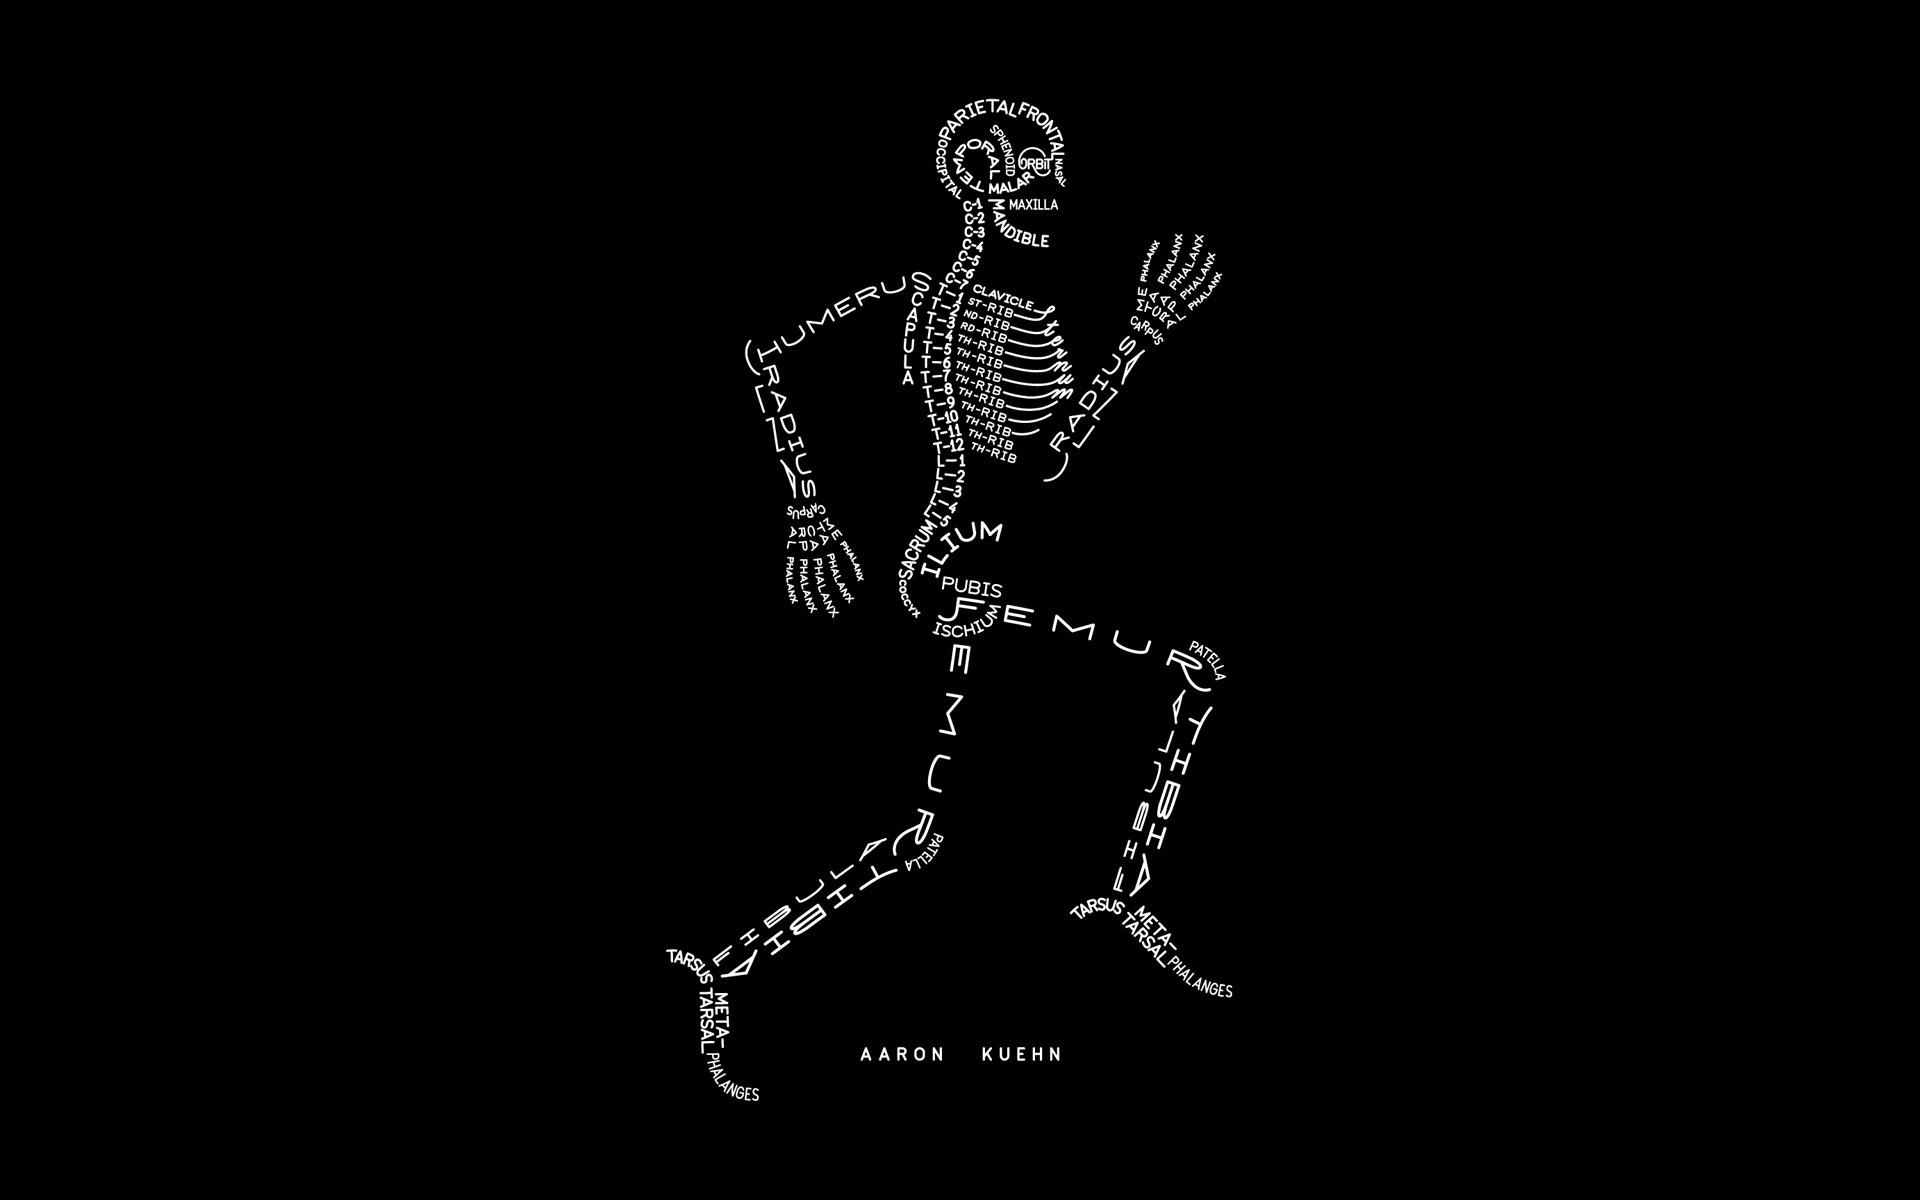 Движущиеся картинки на телефон скелеты